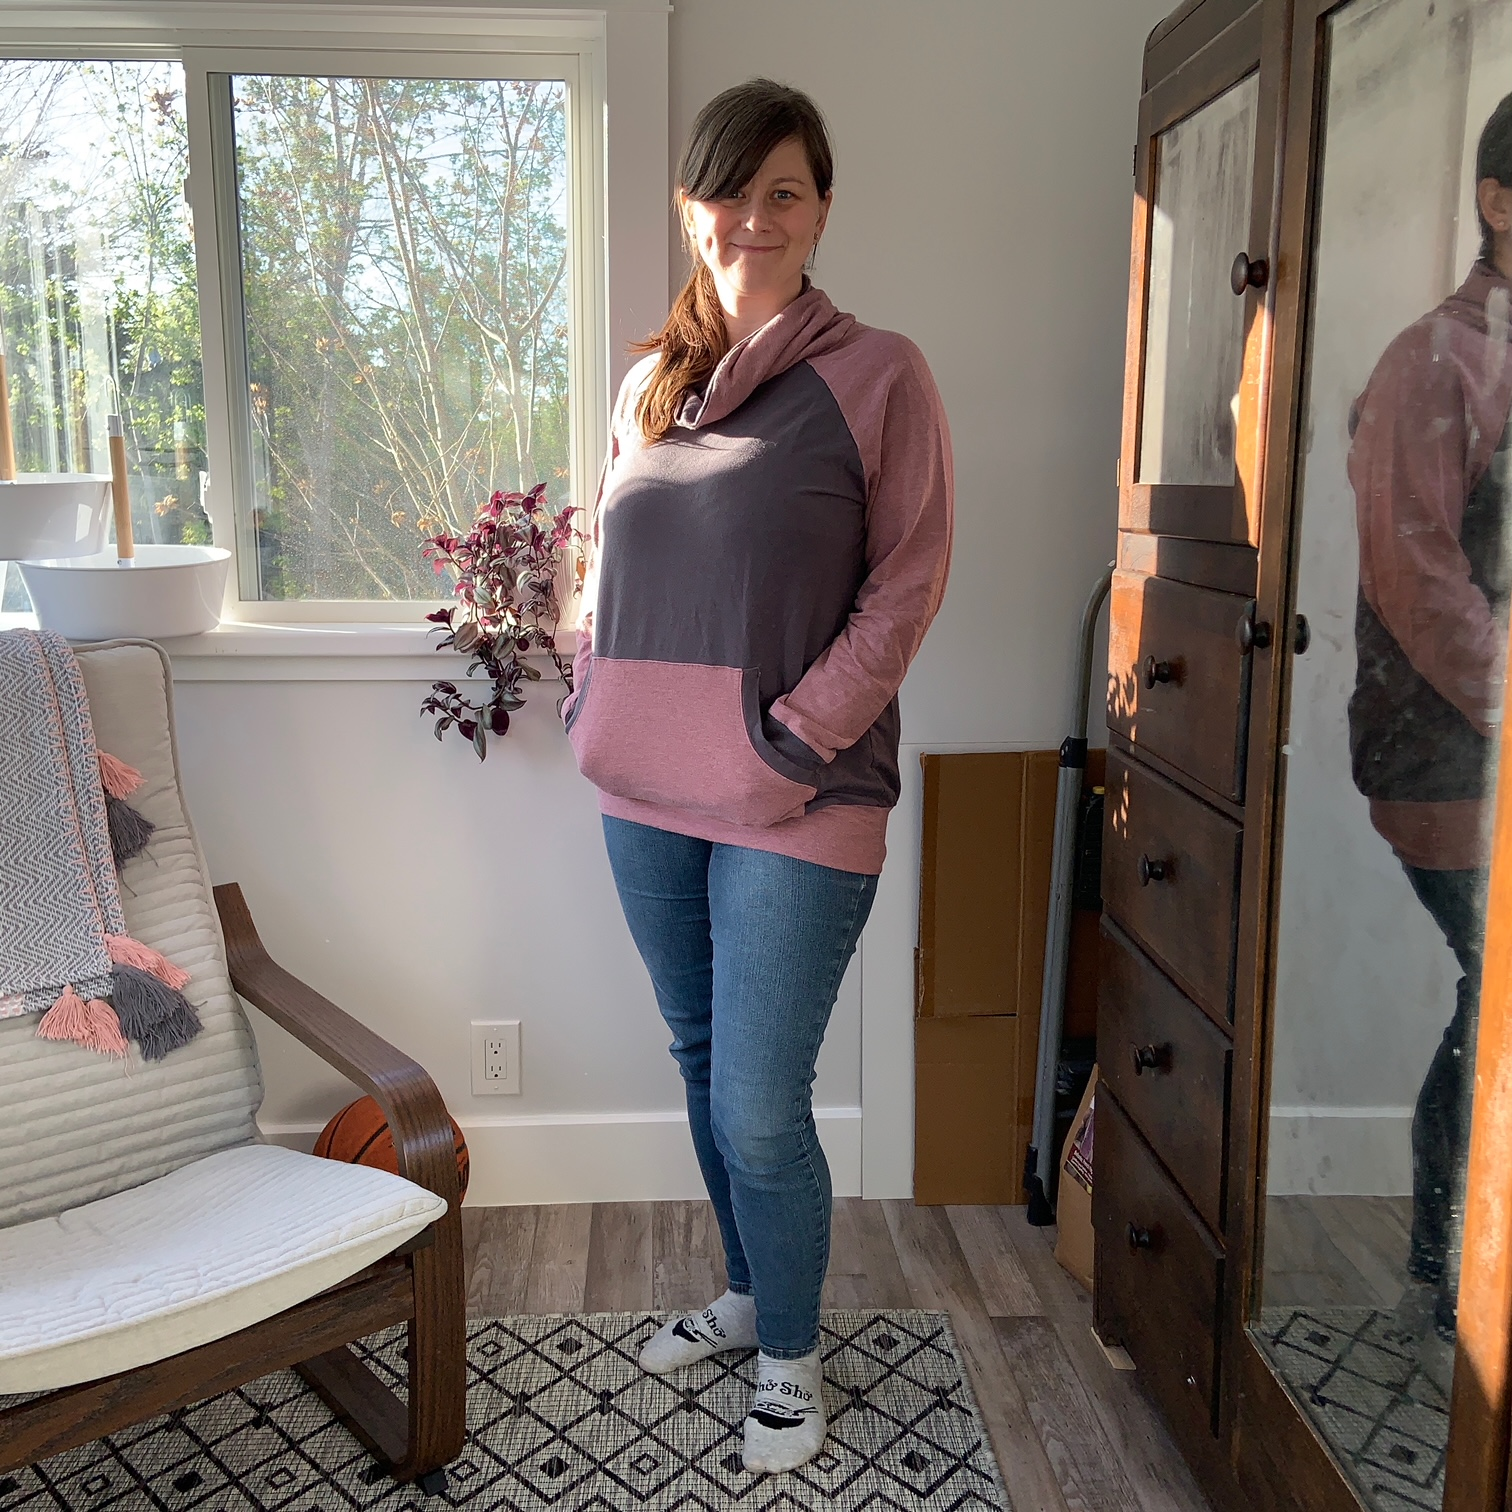 The Nova Sweatshirt by Sinclair Patterns